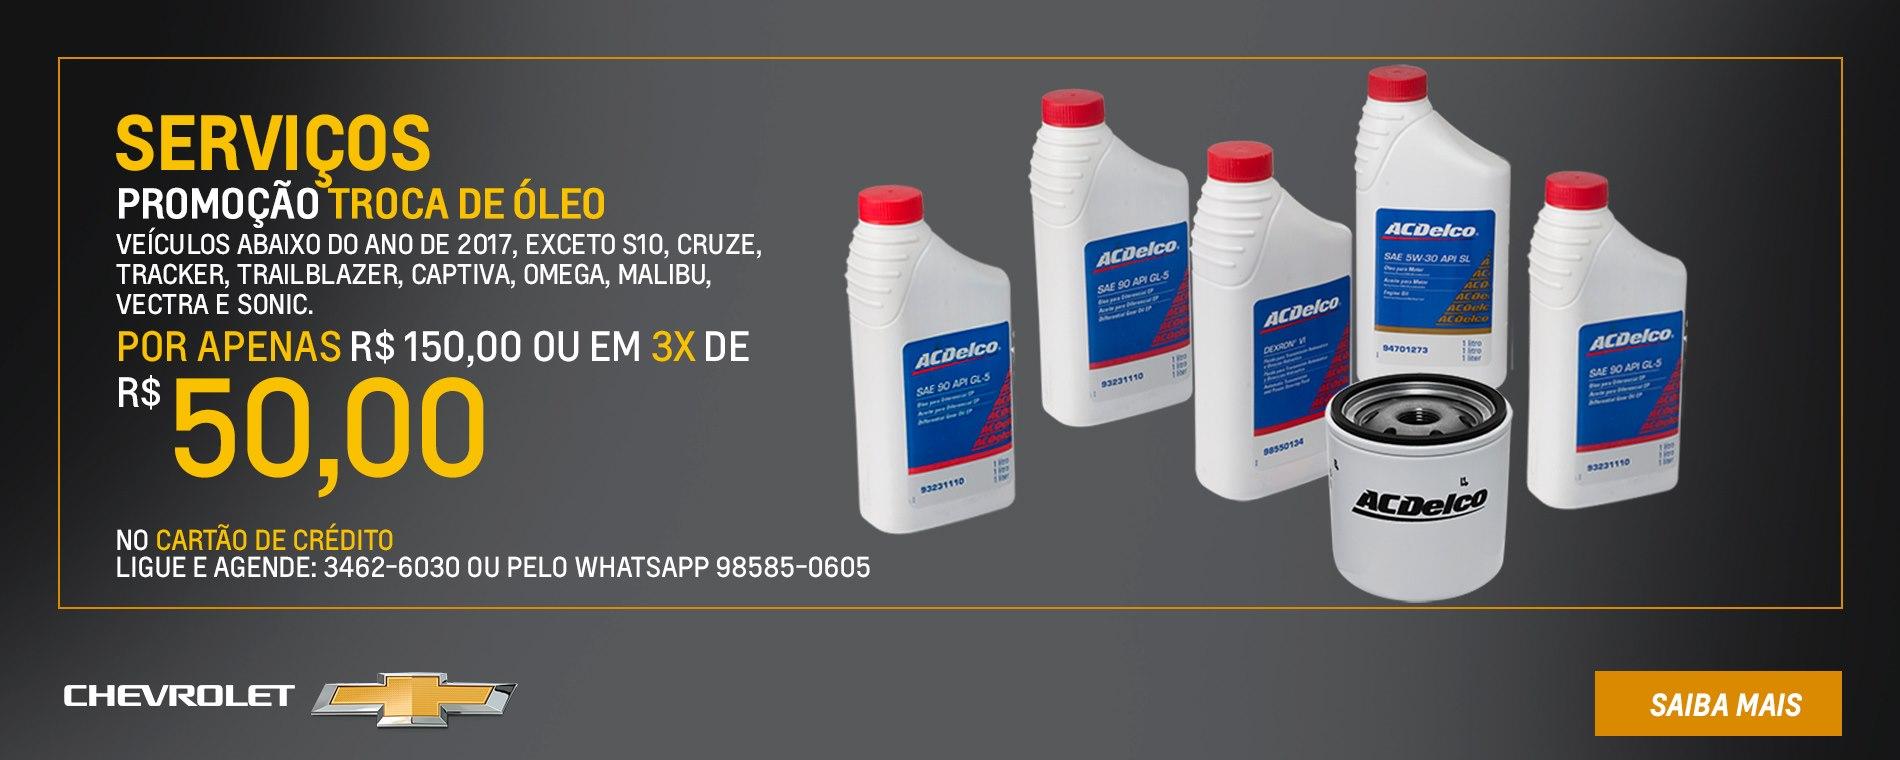 147_Brozauto_Promocao-de-Troca-de-oleo-e-Filtro_DestaqueDesk